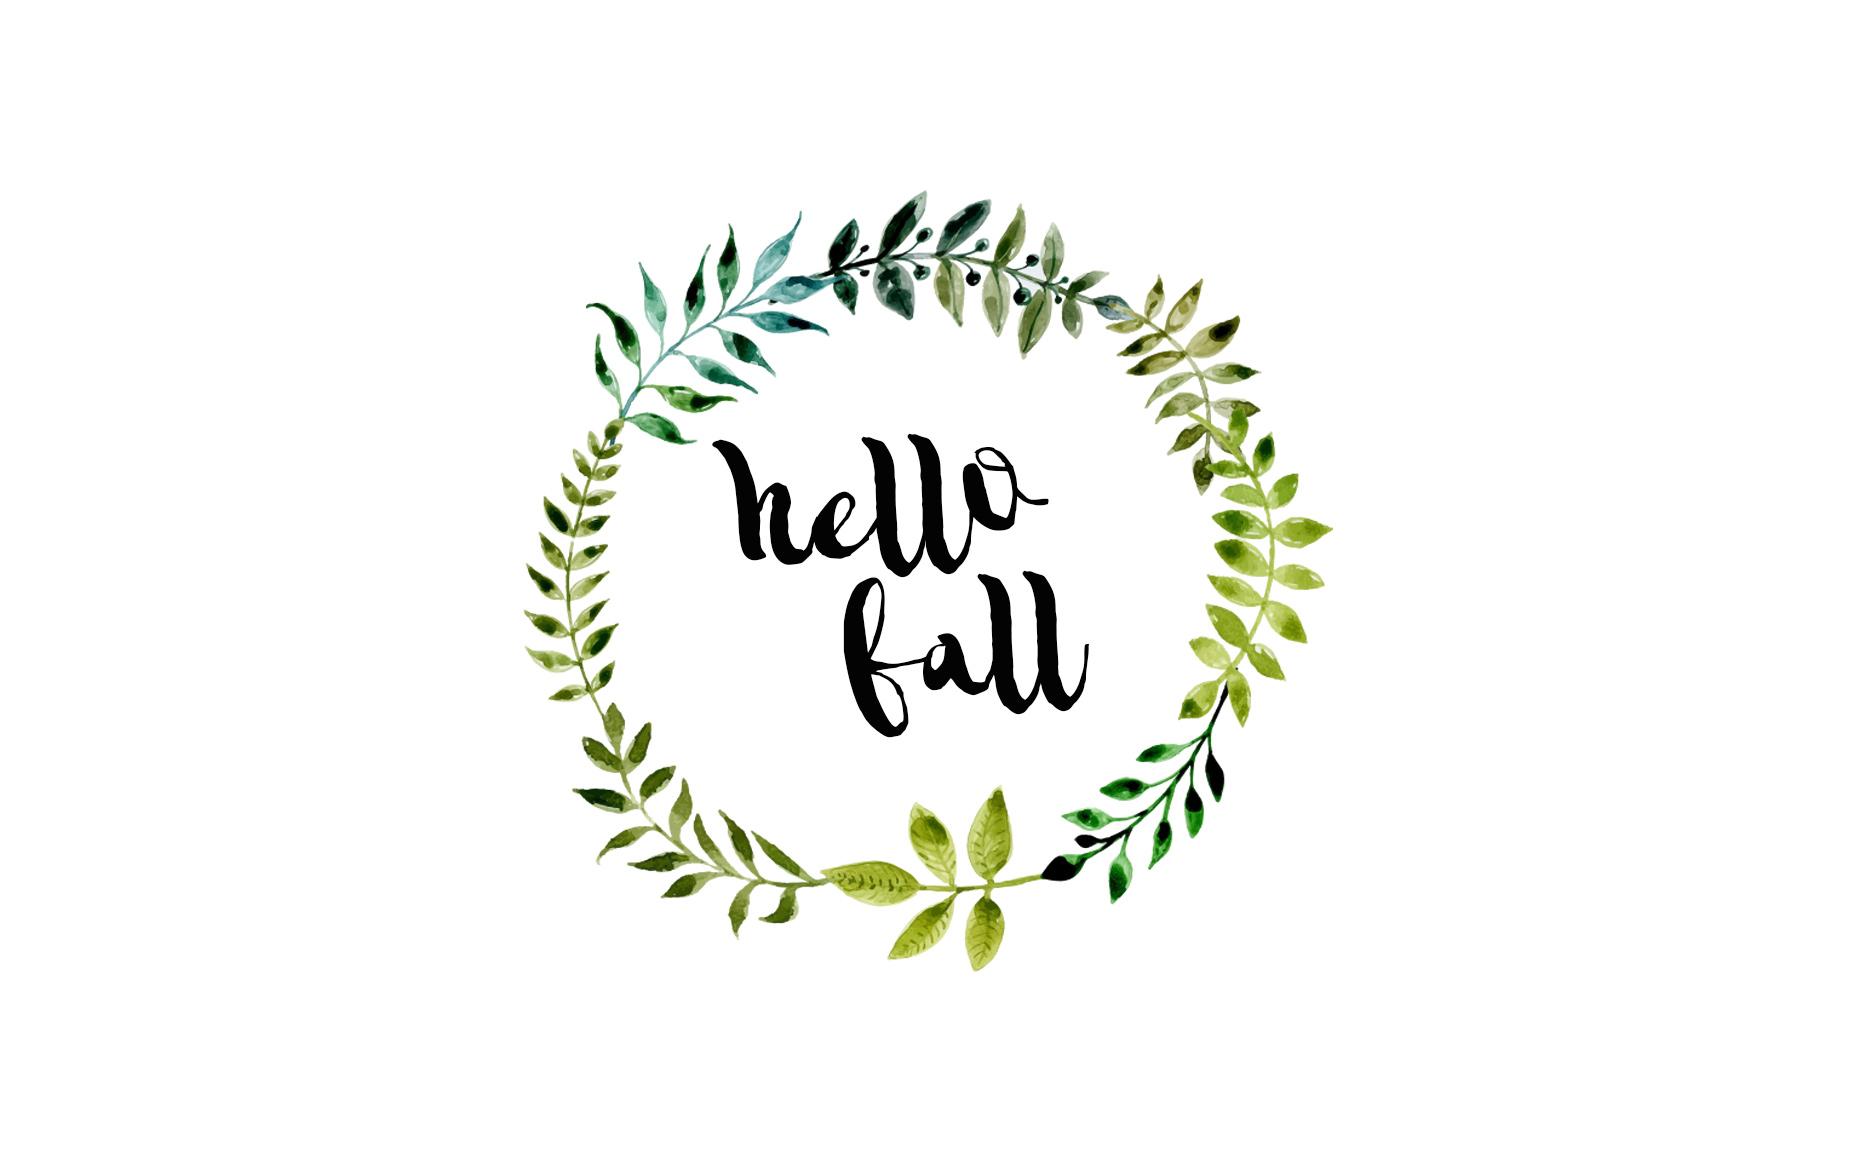 Fall Season Wallpapers Desktop Mantra Monday Hello Fall A Sunshine Mission